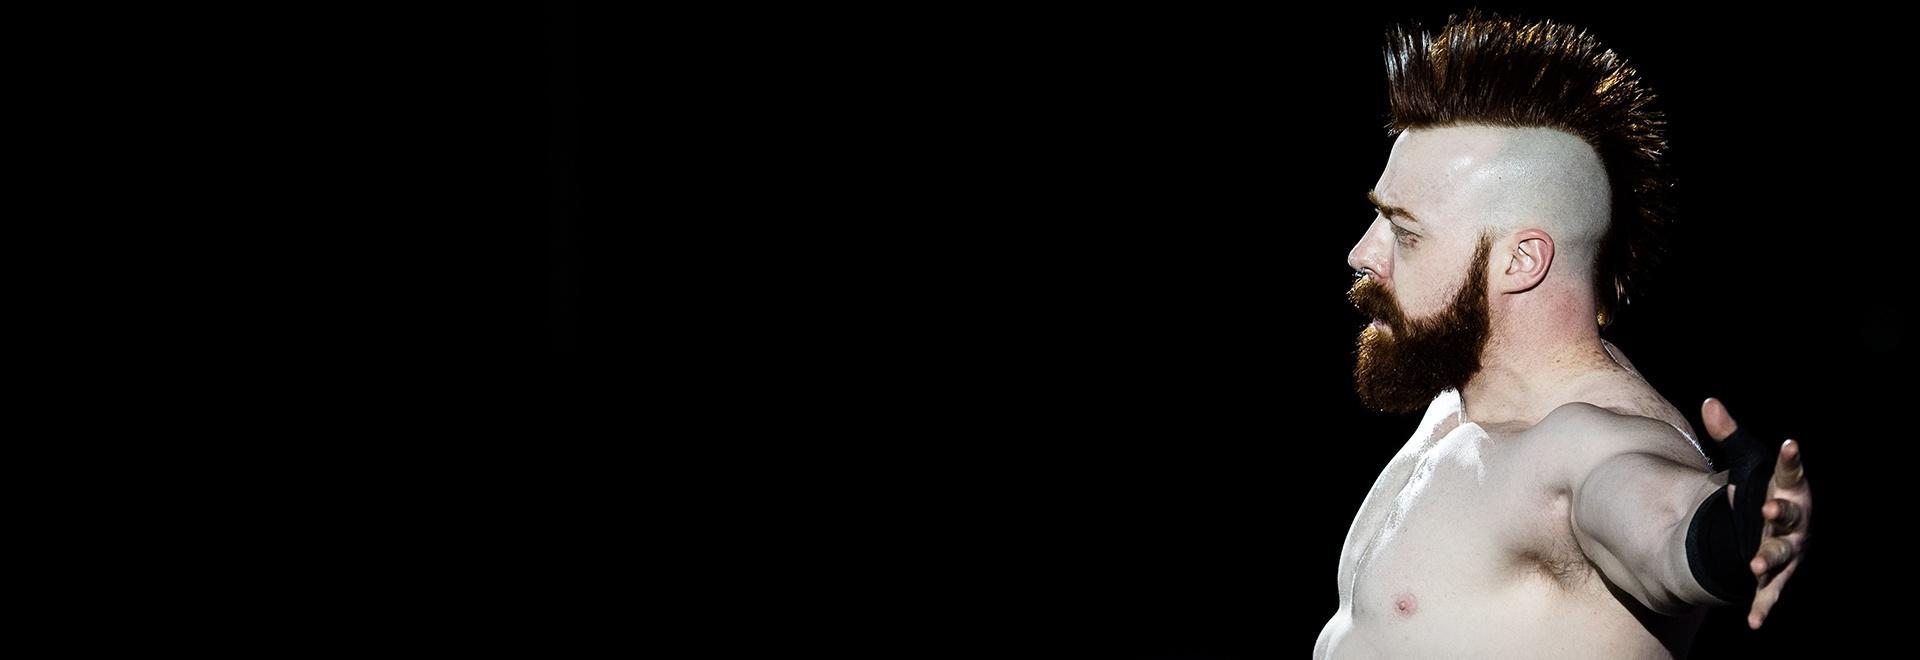 Ep. 44